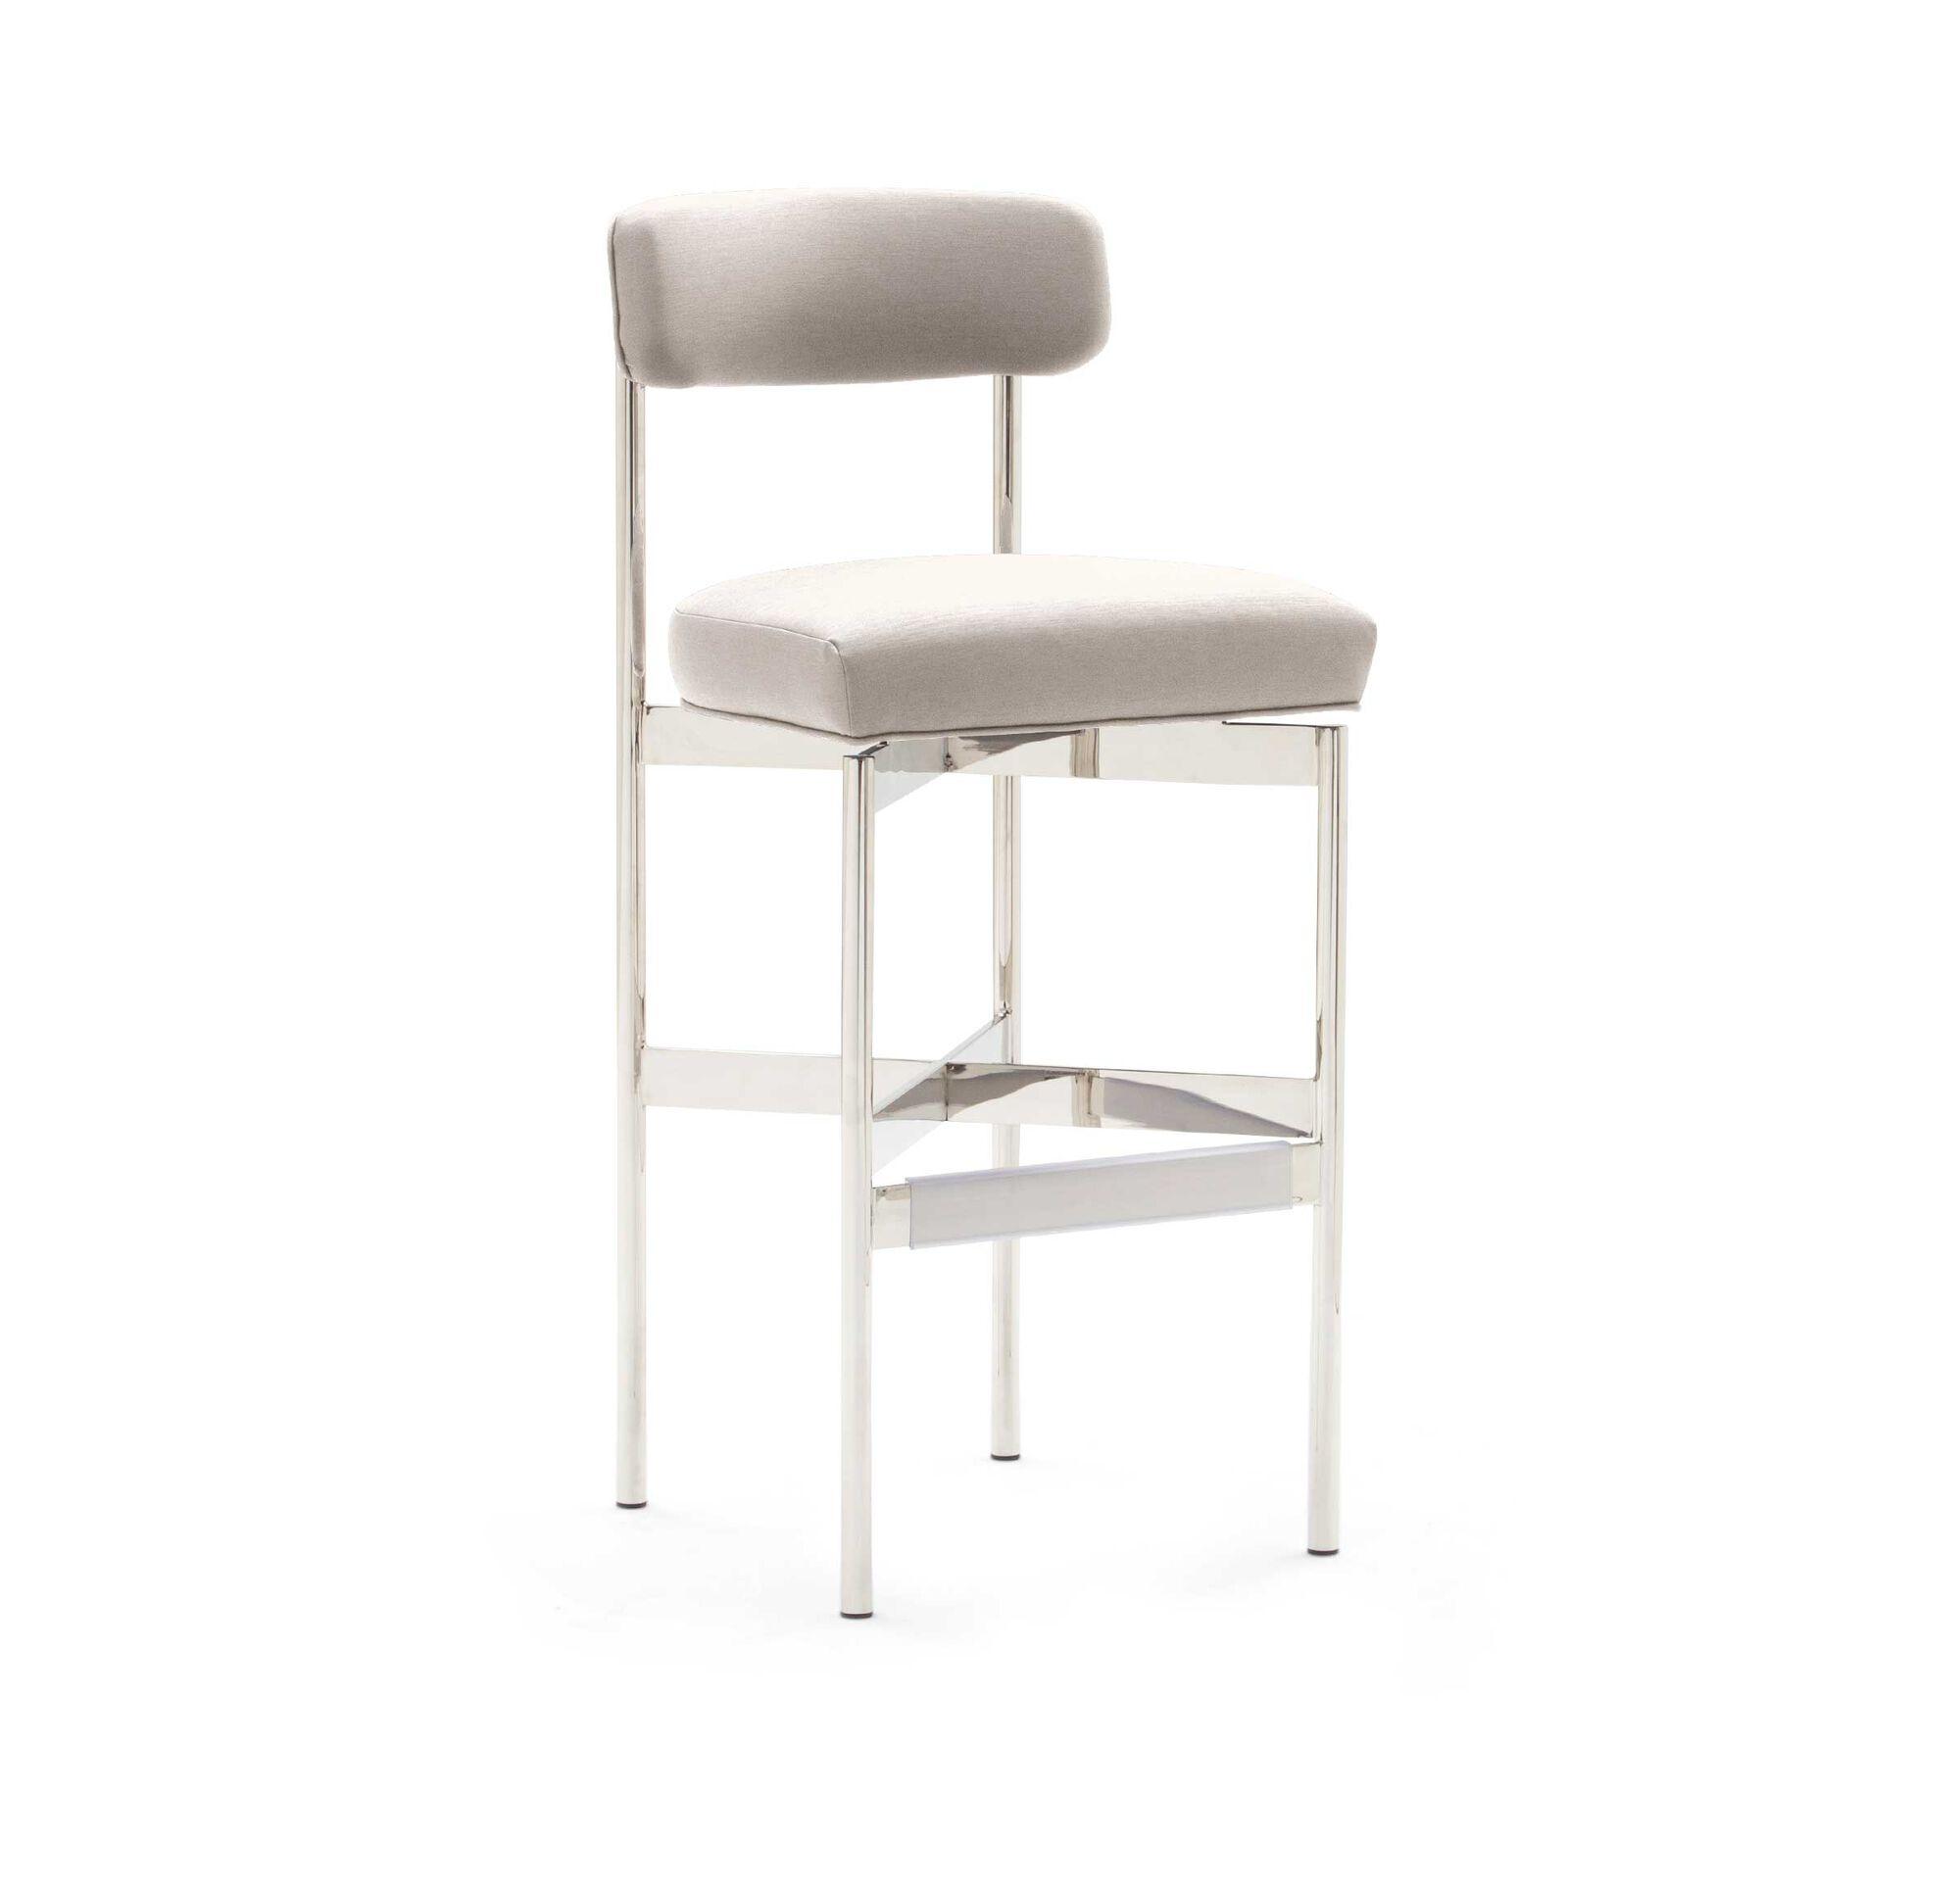 Super Remy Bar Stool Spiritservingveterans Wood Chair Design Ideas Spiritservingveteransorg